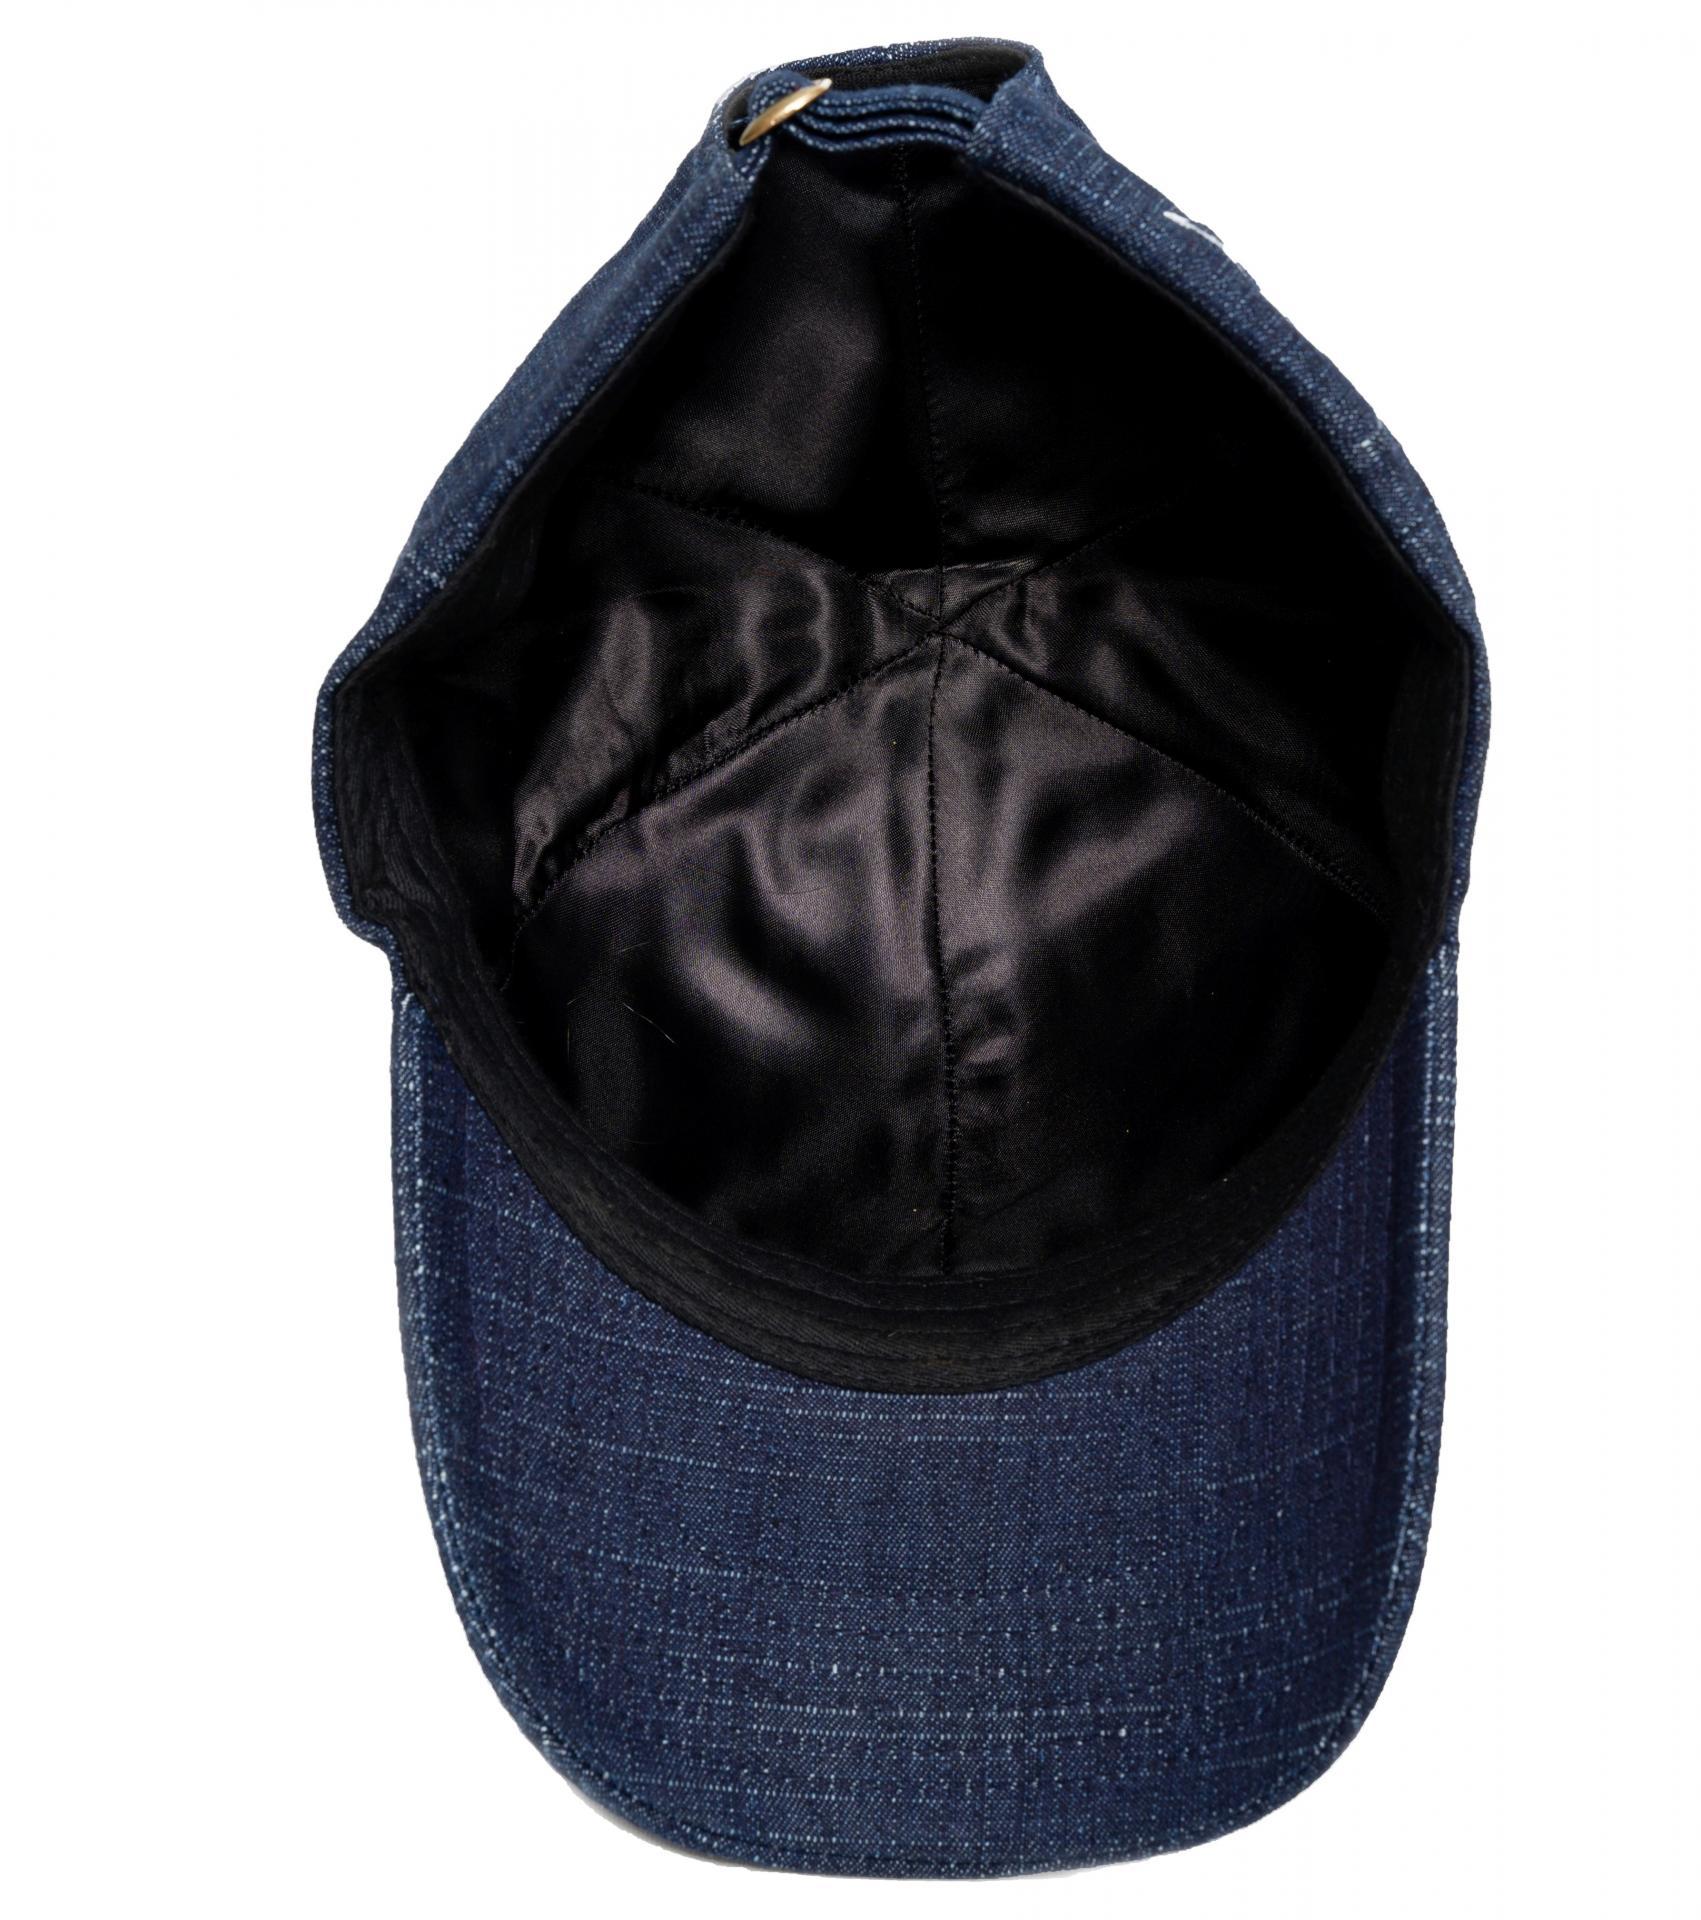 JEAN CAP 3